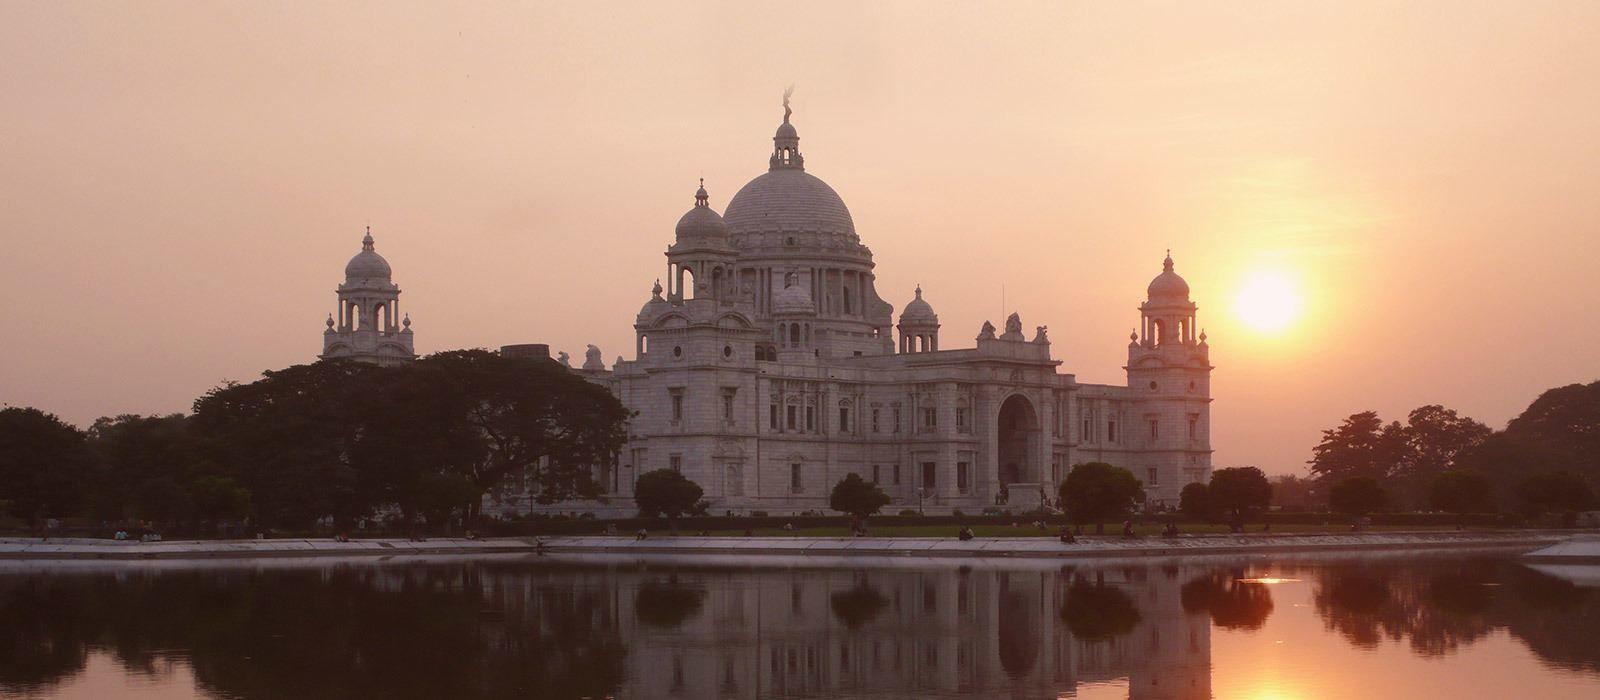 Taj Mahal und Berggipfel: Vom Goldenen Dreieck zum Himalaya Urlaub 4